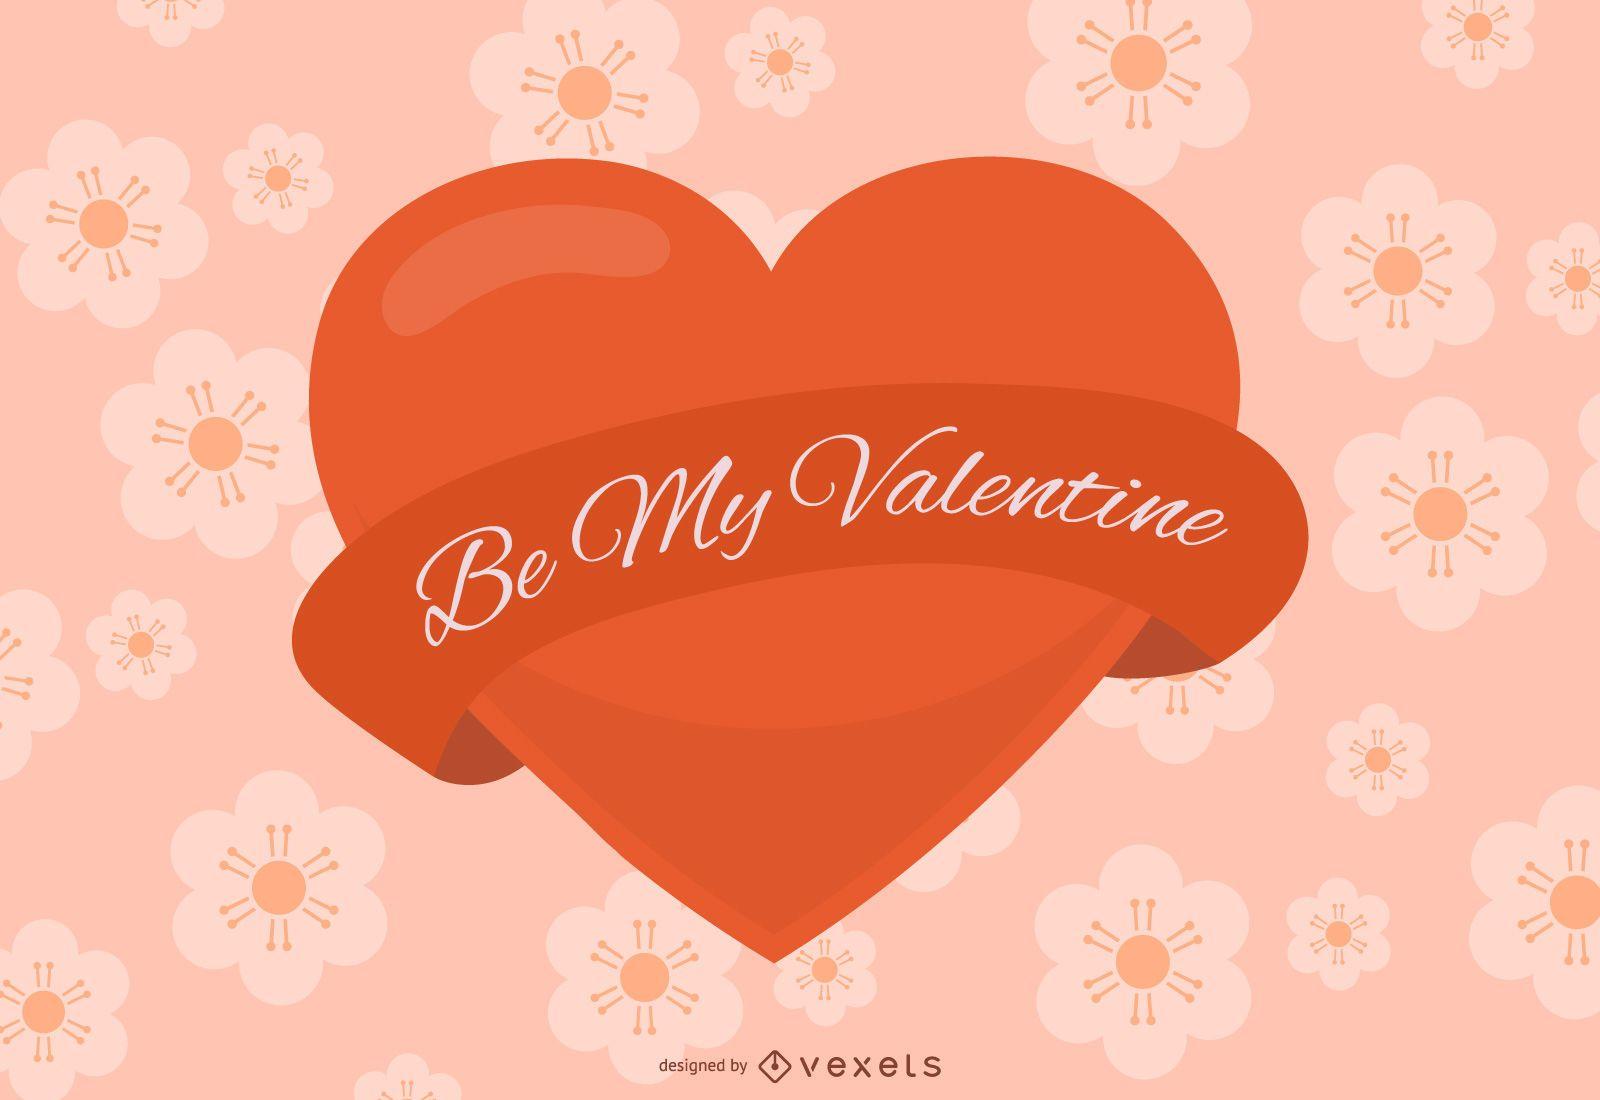 Be My Valentine Glossy Heart